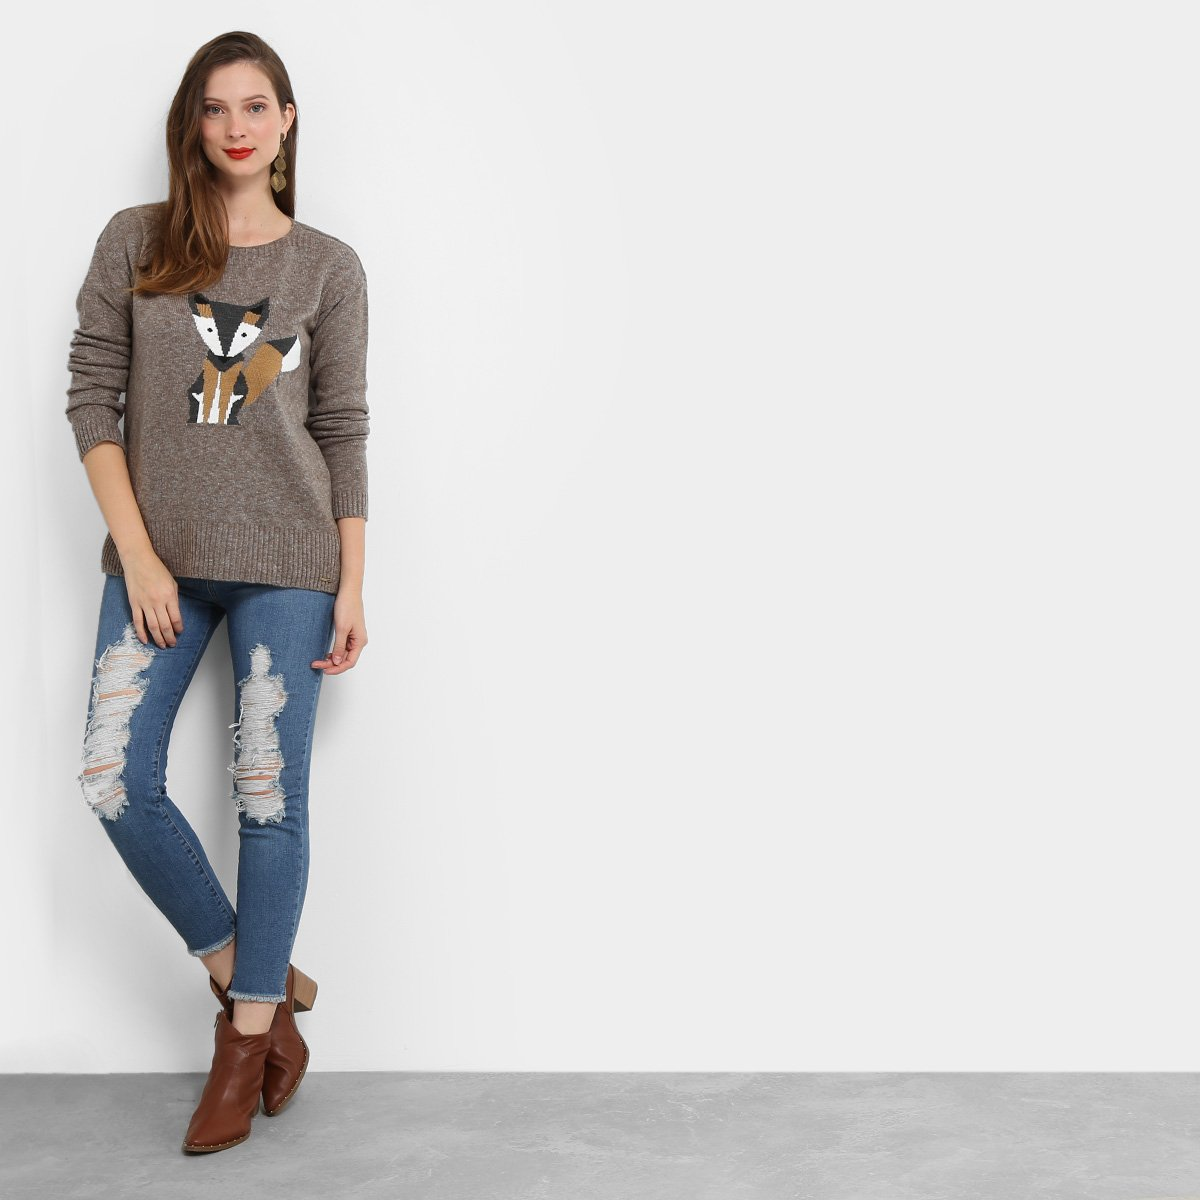 Calça Jeans Skinny Mob Estonada Rasgada Cintura Média Feminina - Jeans t8U1Gijy